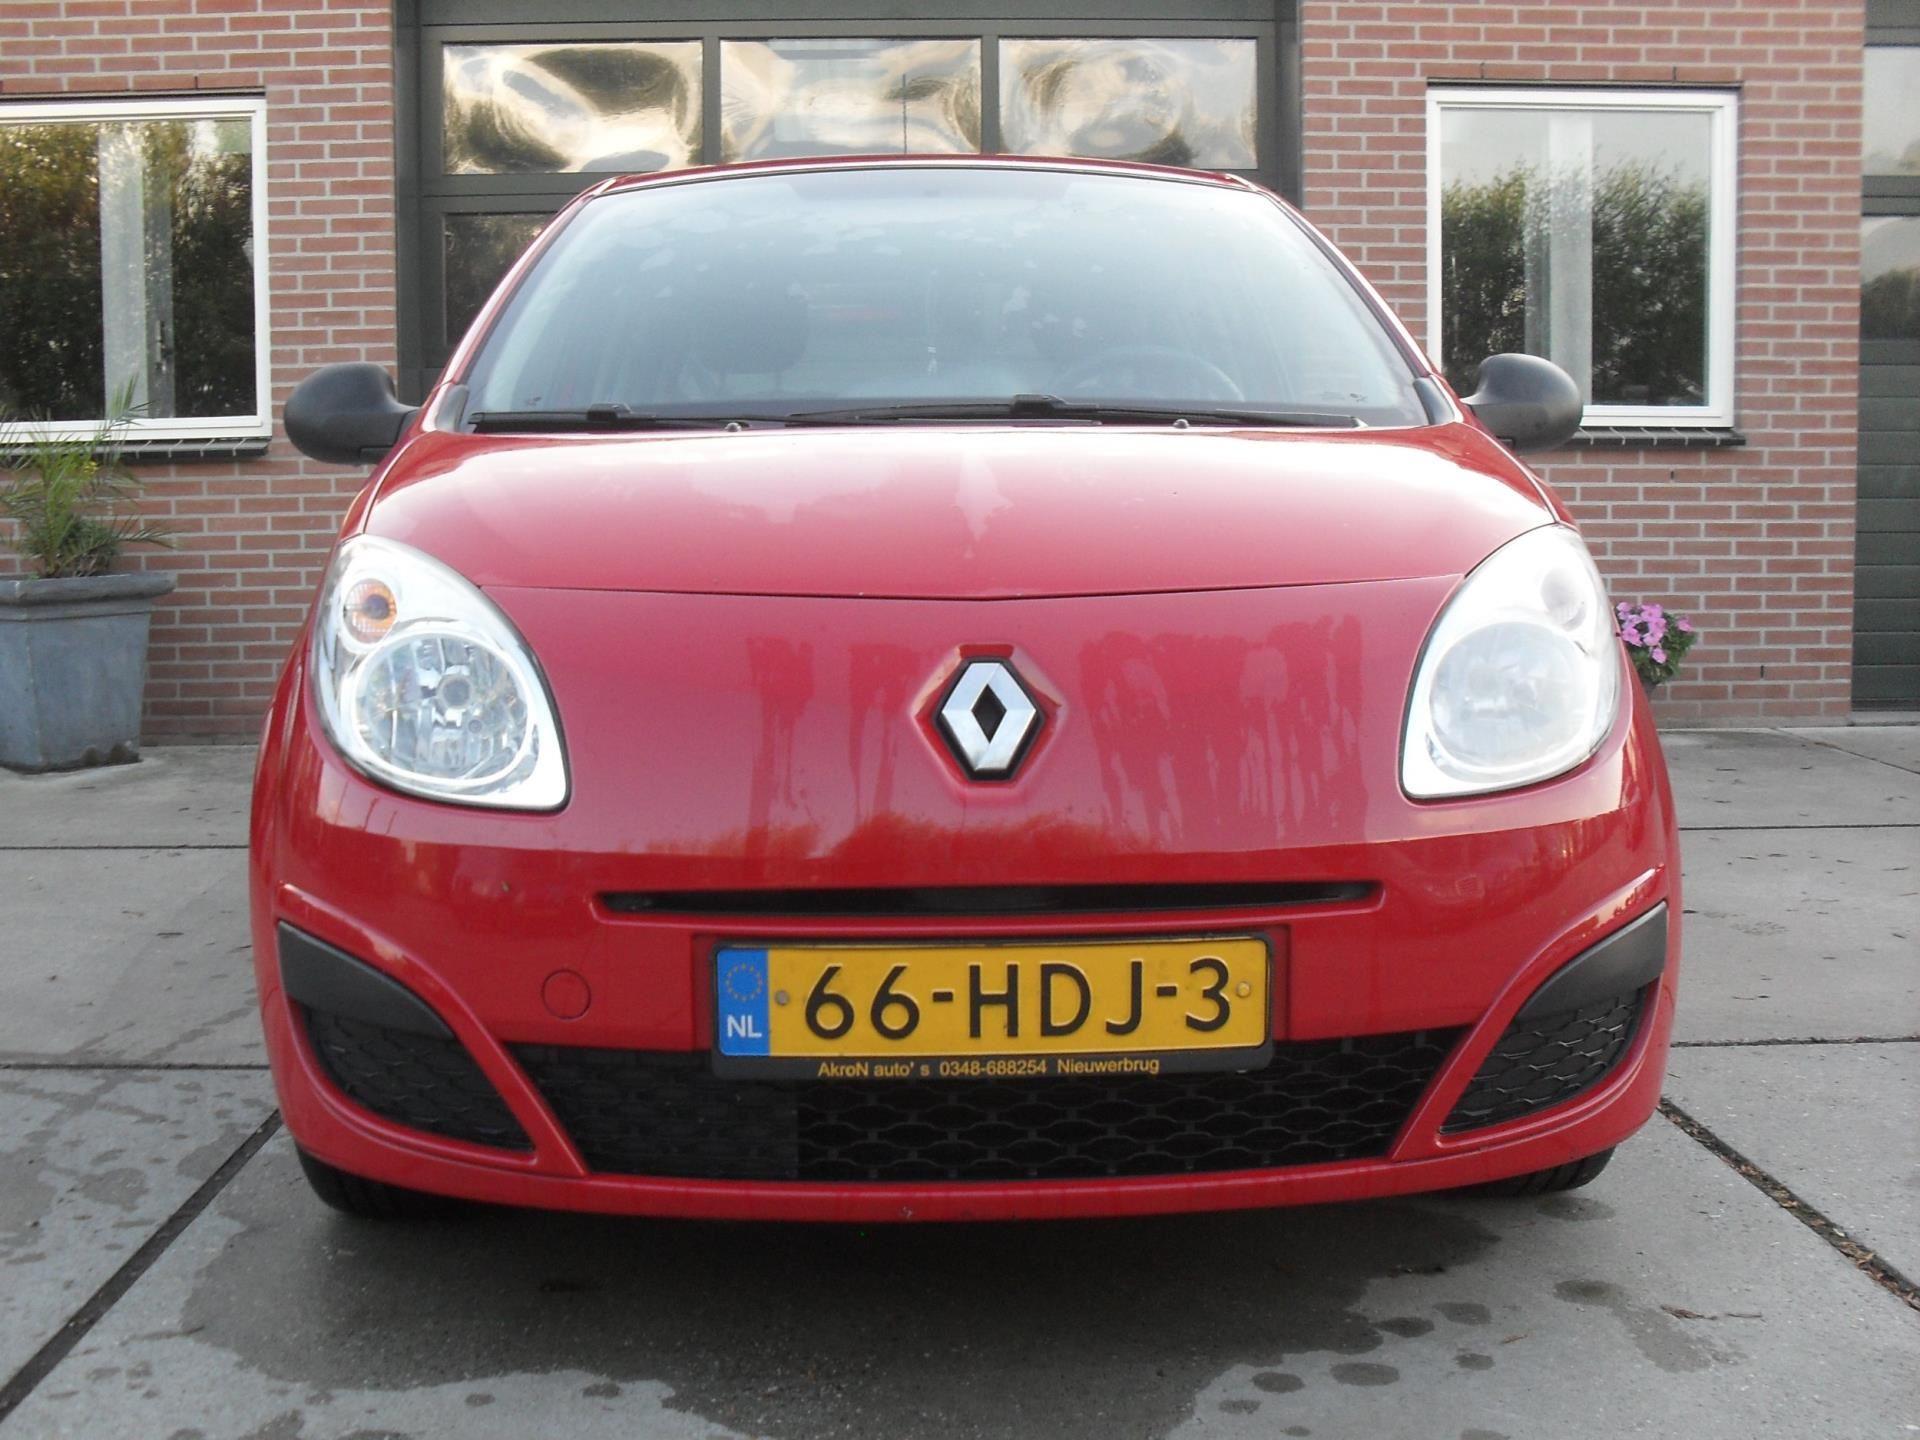 Renault Twingo occasion - AkroN Auto's